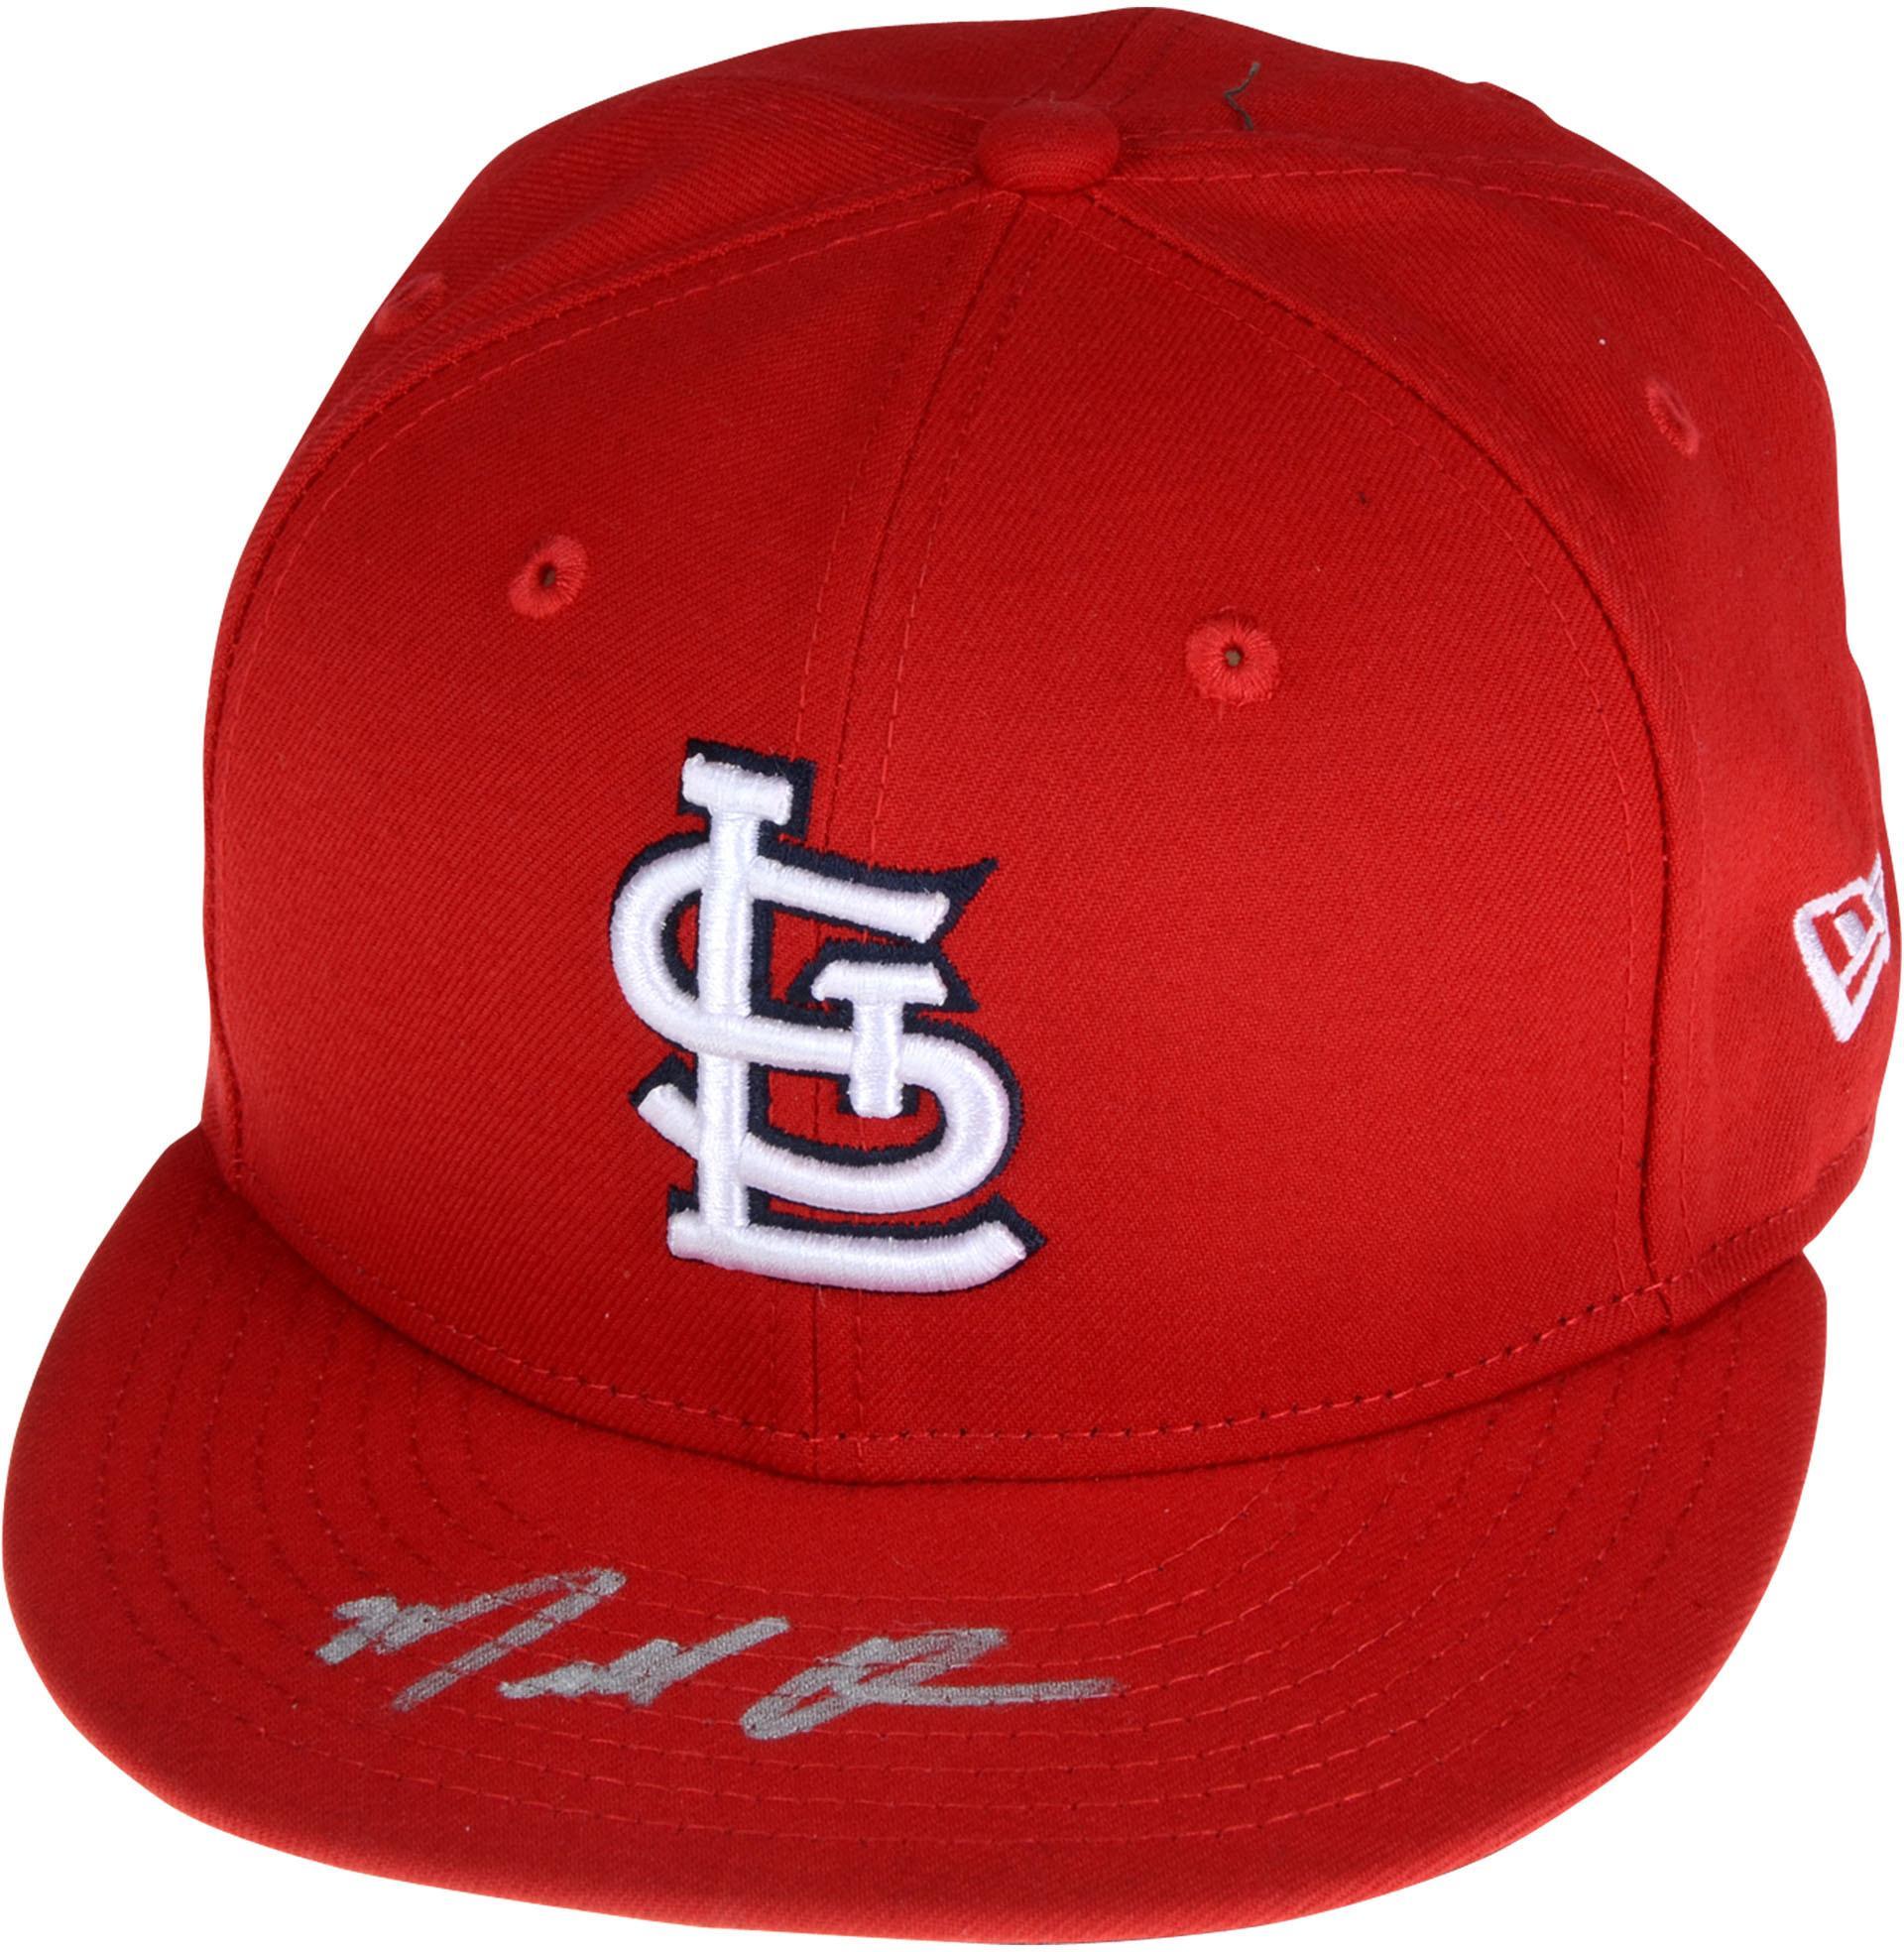 Marcell Ozuna St. Louis Cardinals Autographed New Era Cap - Fanatics Authentic Certified